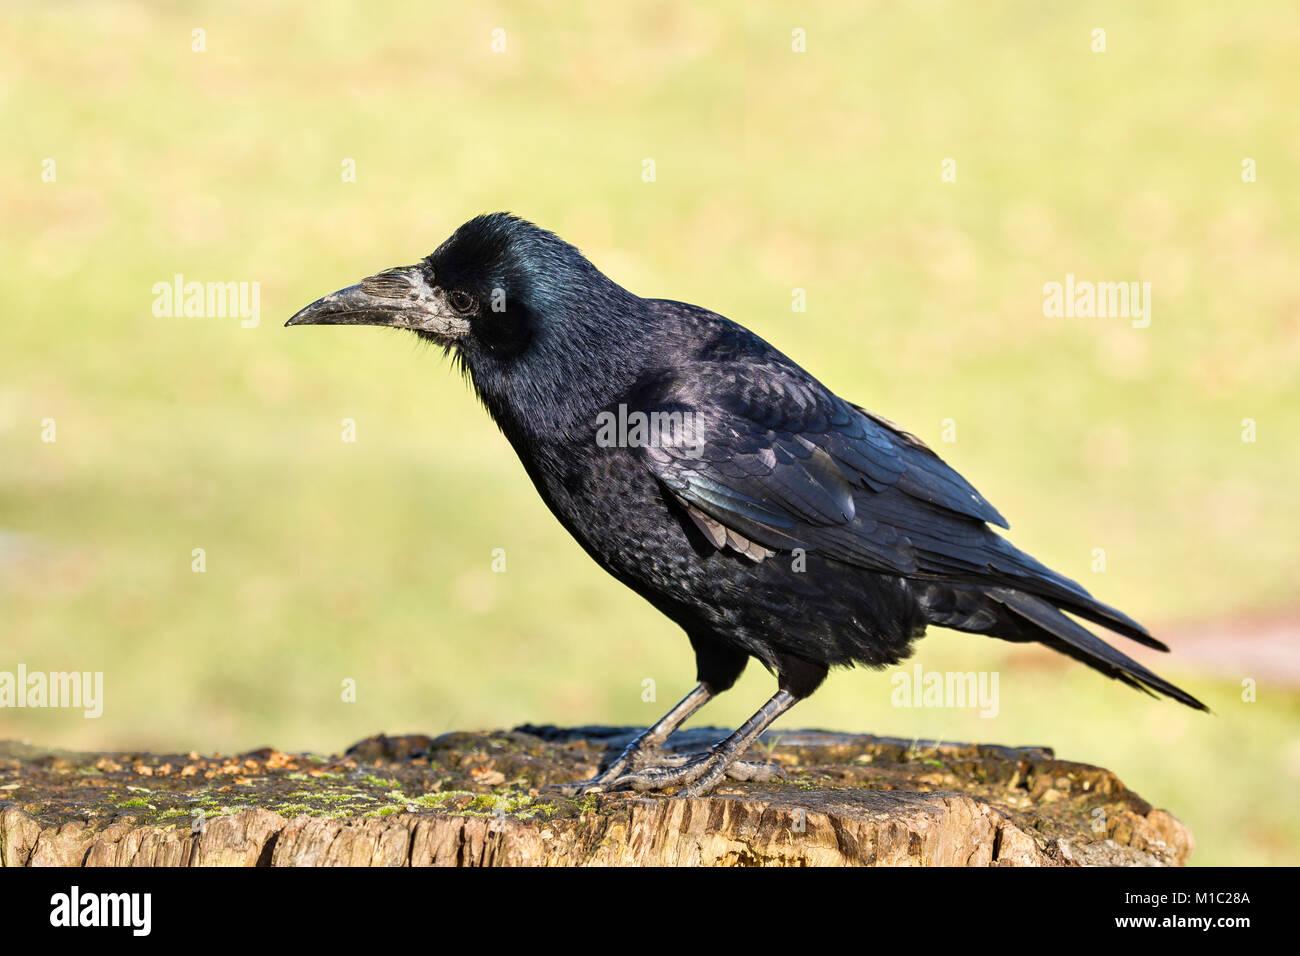 Rook, Corvus frugilegus, Wildgeflügel und Feuchtgebiete Vertrauen, Slimbridge, Gloucestershire, UK. Stockbild